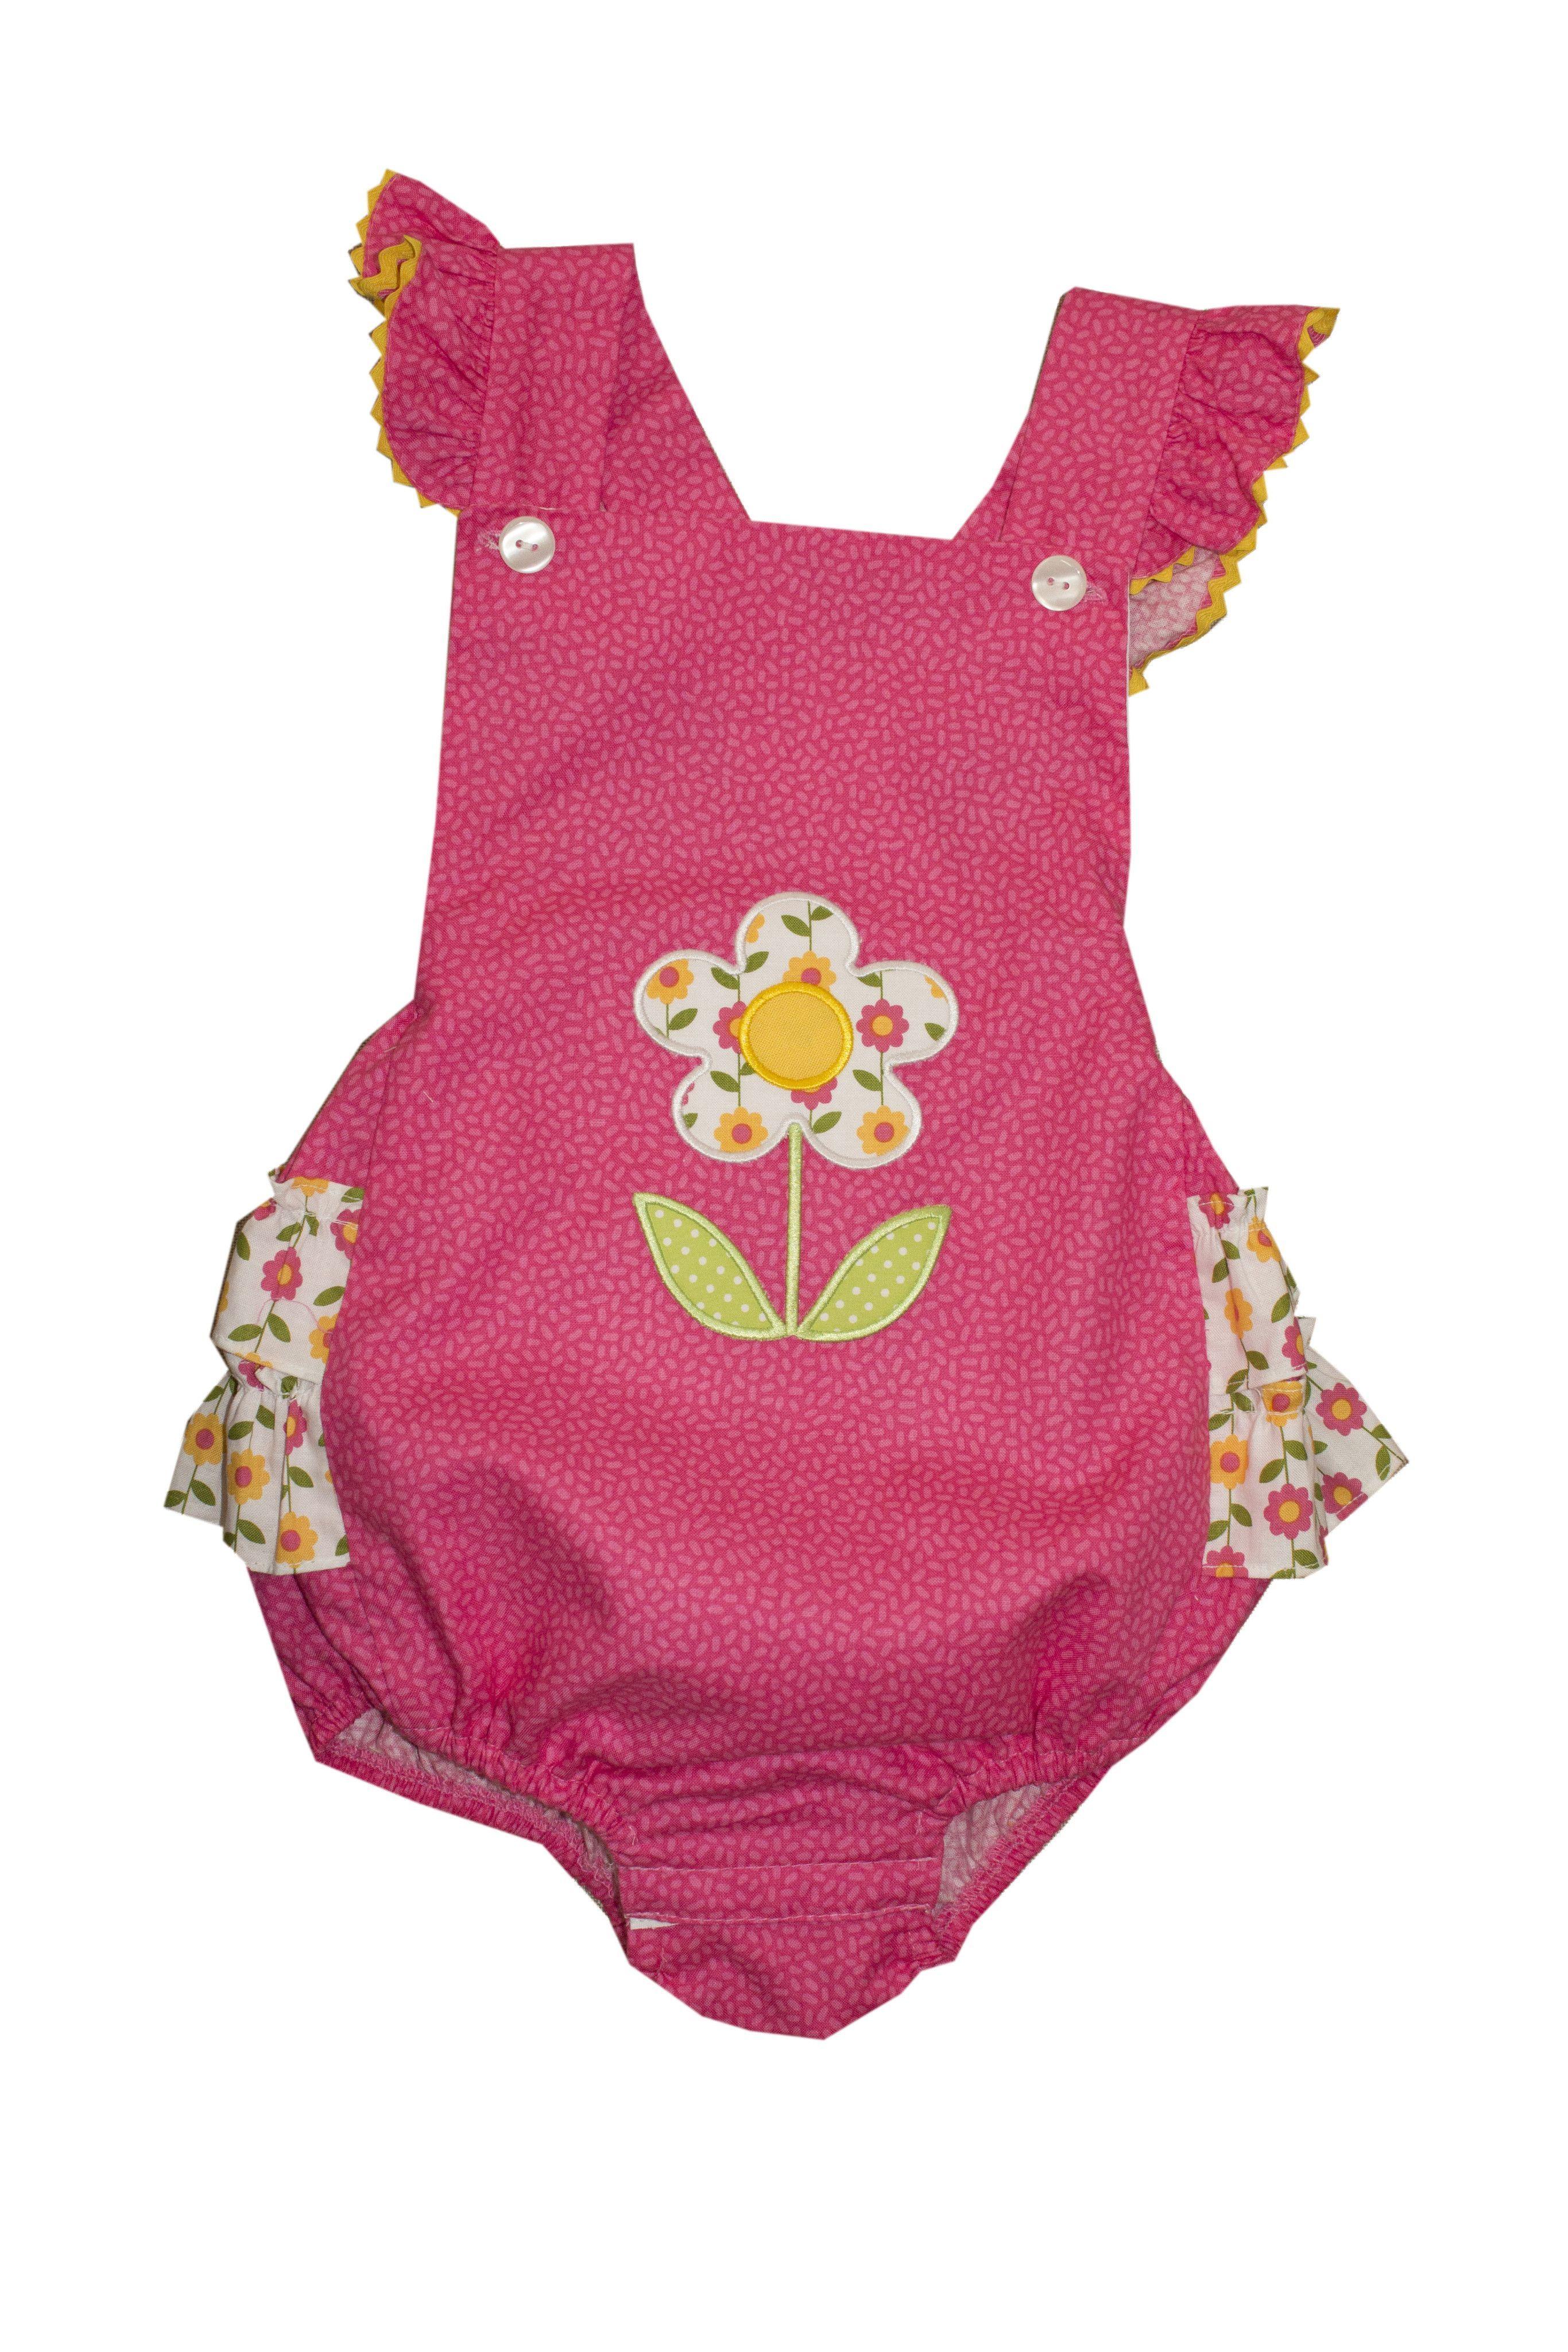 c1bb963292d Love this Kandyland Fuchsia Floral Appliqué Bubble Romper - Infant by  Kandyland on